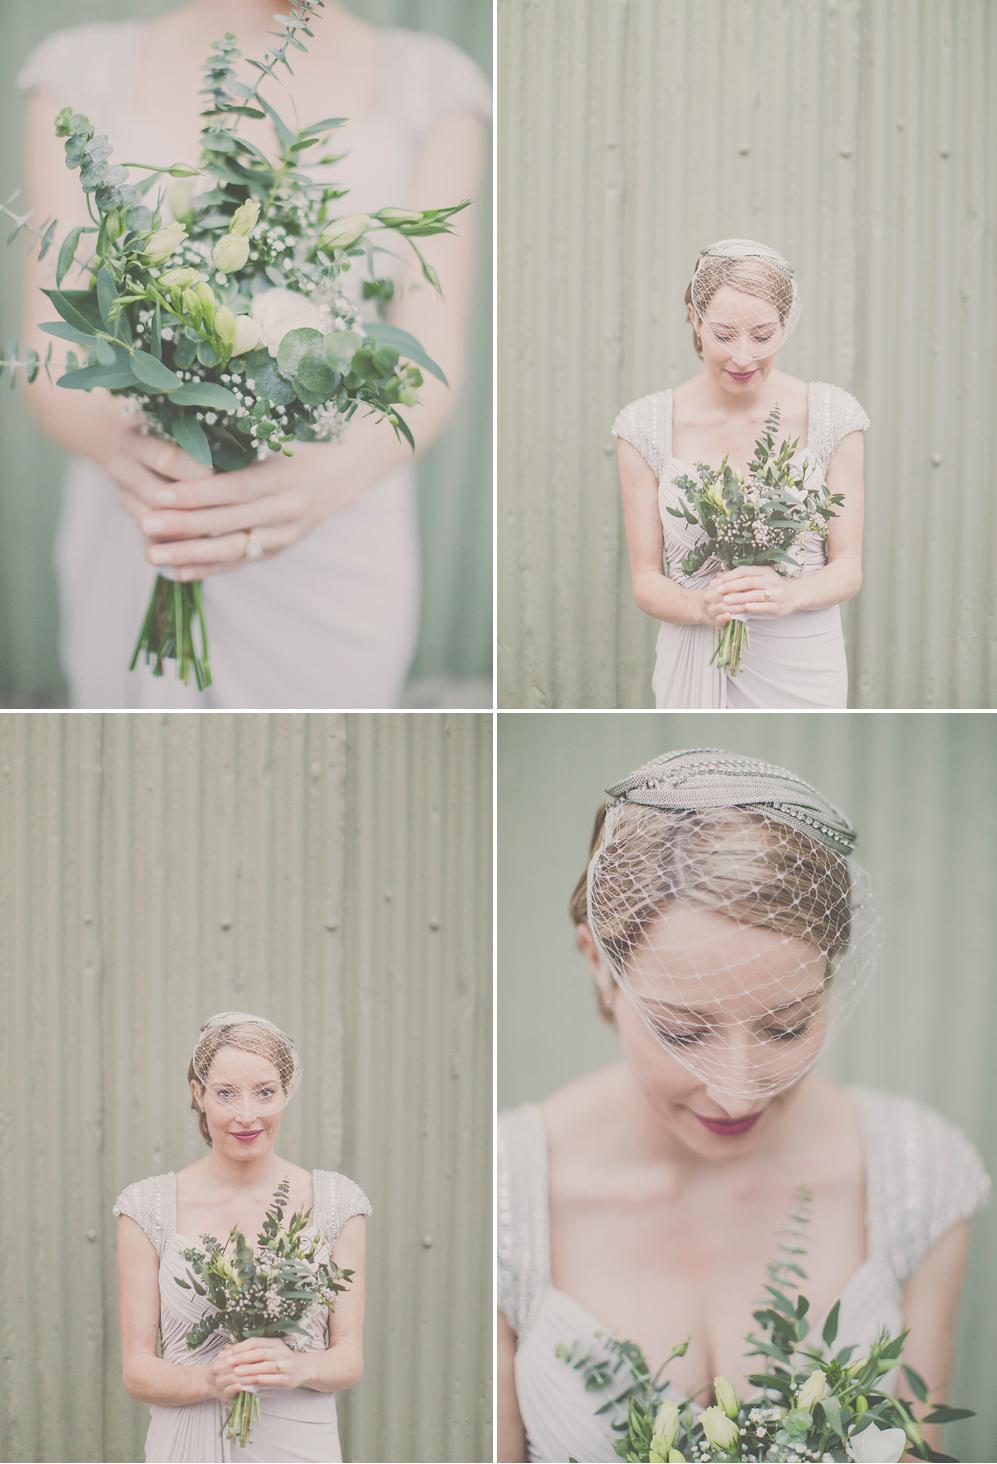 Milk Station Wedding by Wellington wedding photographer. Jenny Siaosi.